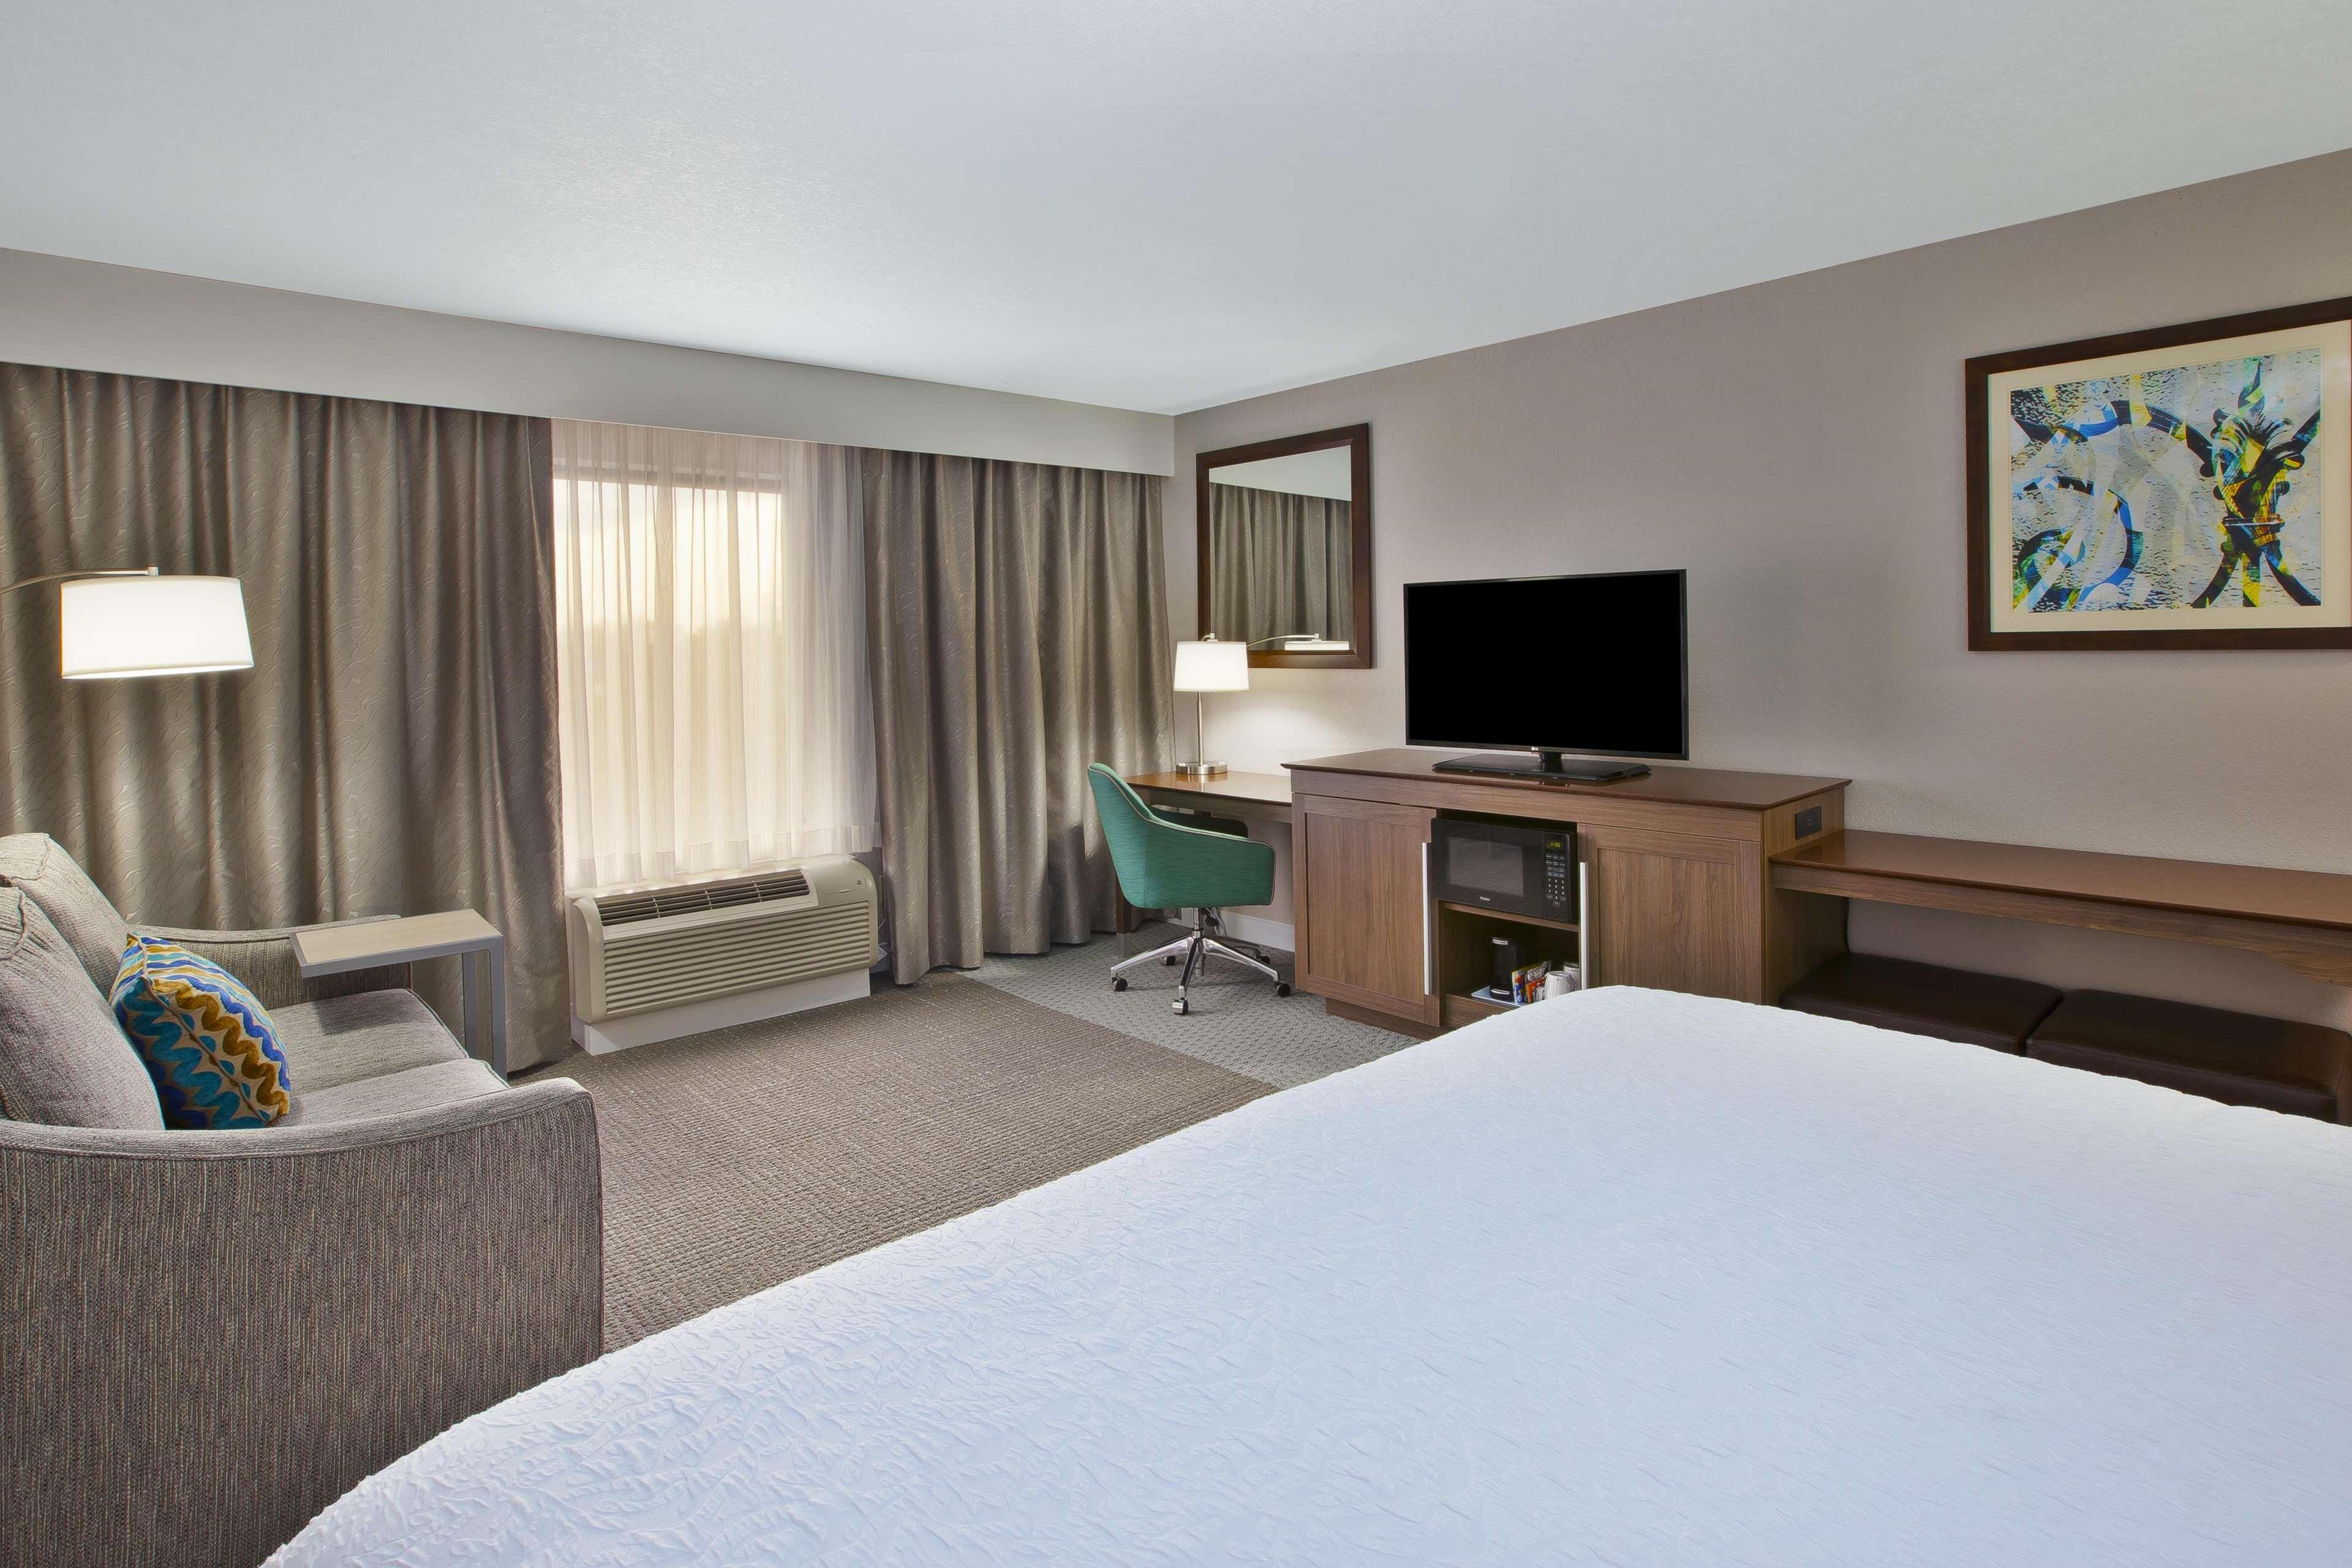 Hampton Inn & Suites Alliance image 12